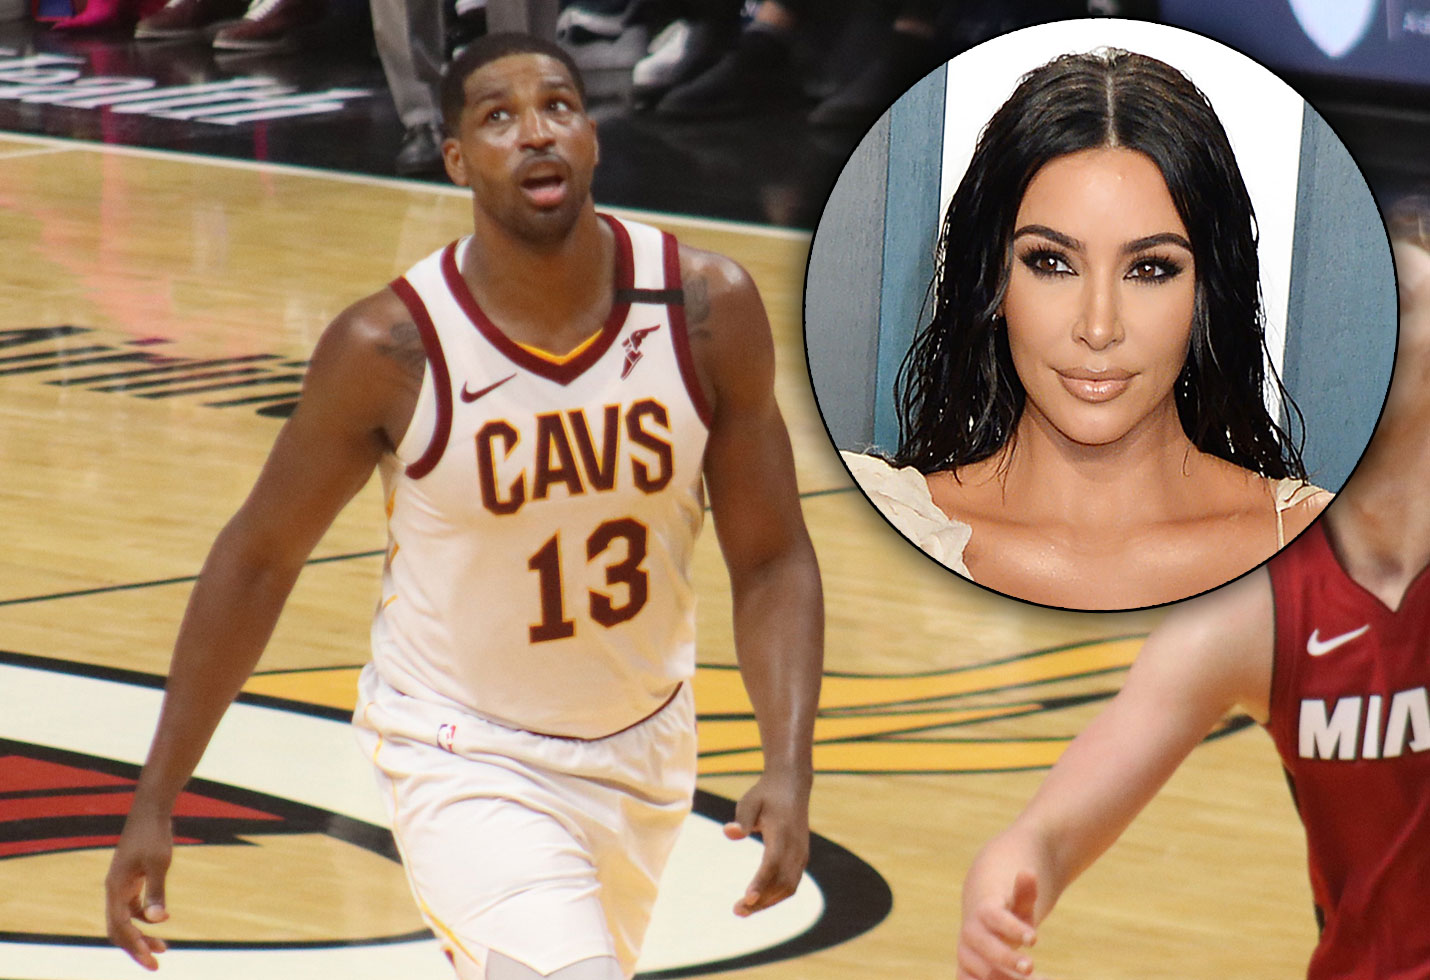 Tristan Thompson playing basketball; Kim Kardashian